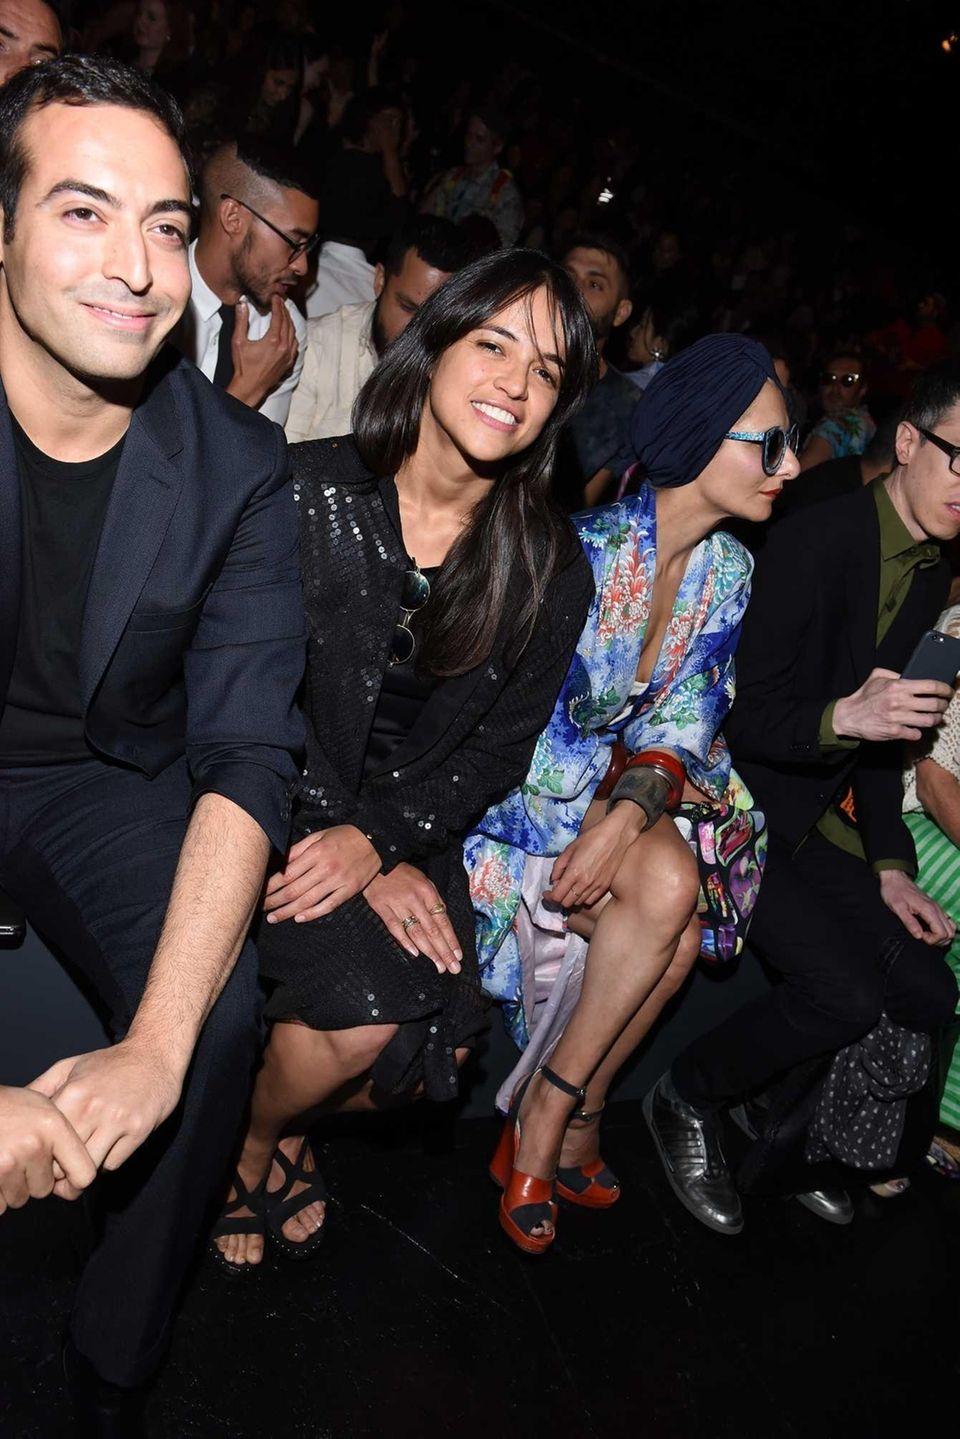 Actress Michelle Rodriguez attends the Jeremy Scott show